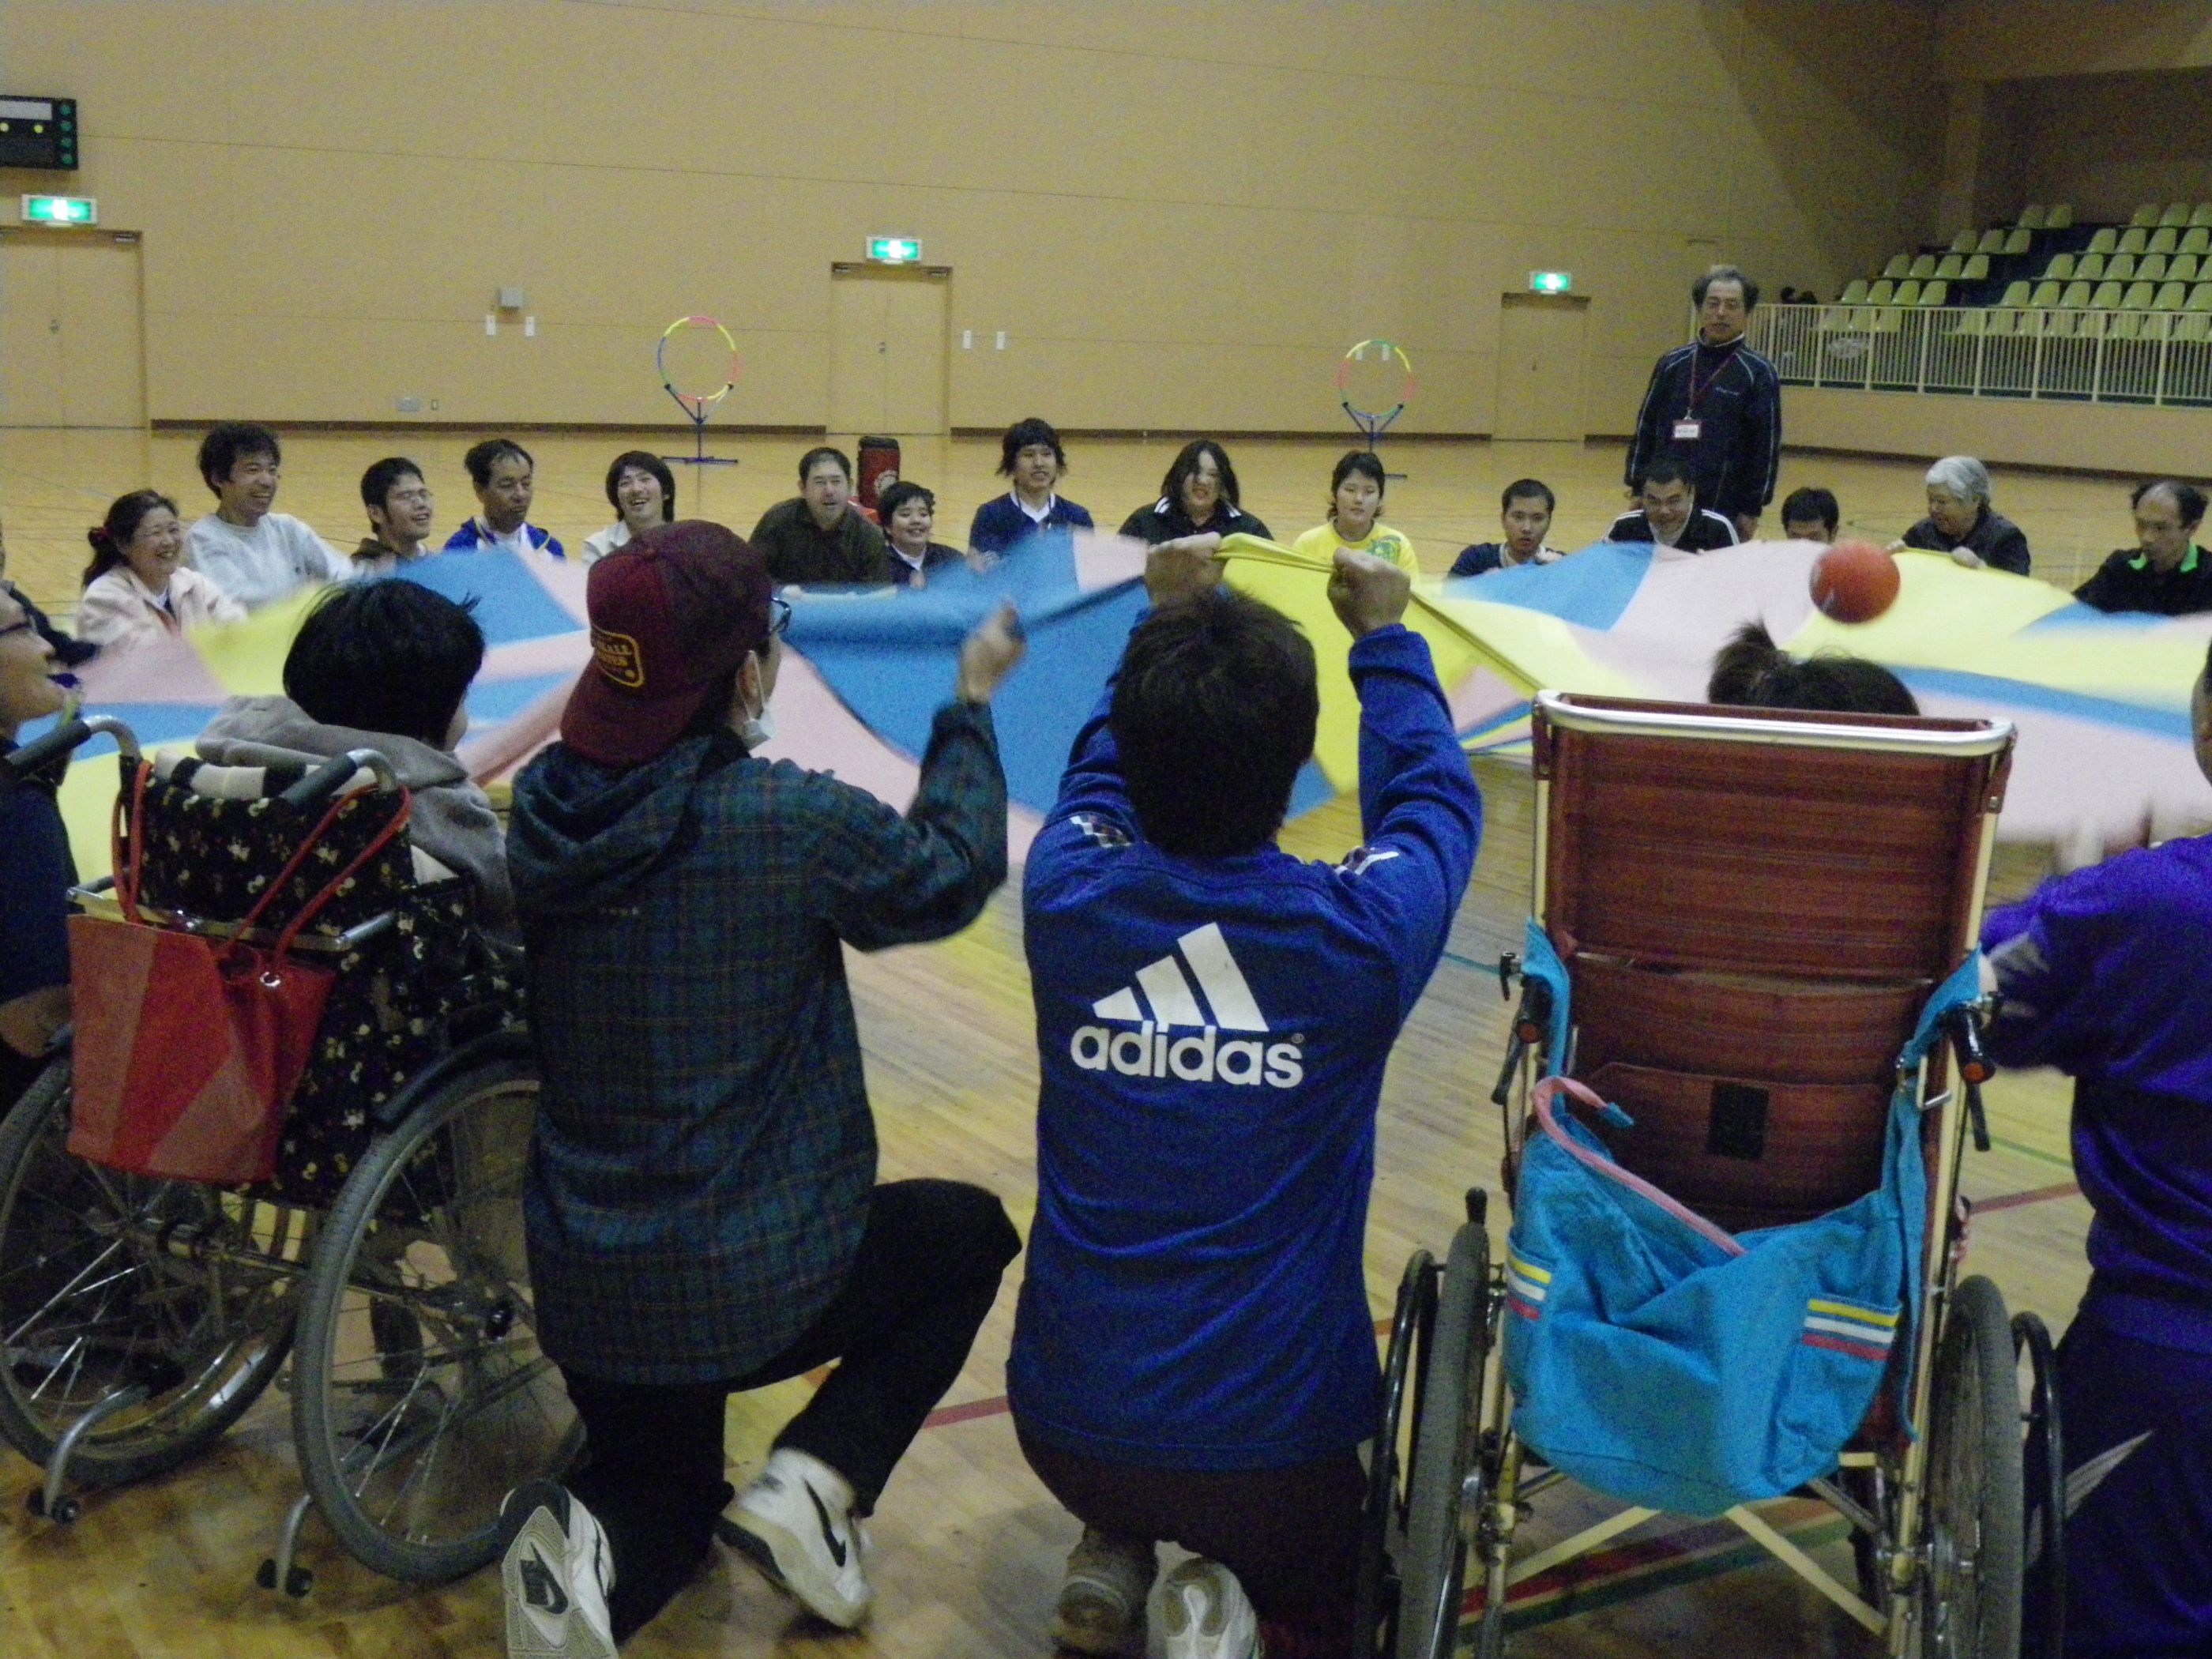 IMGP0057 - 地域支援事業より〜青梅市アダプテッド・スポーツ教室